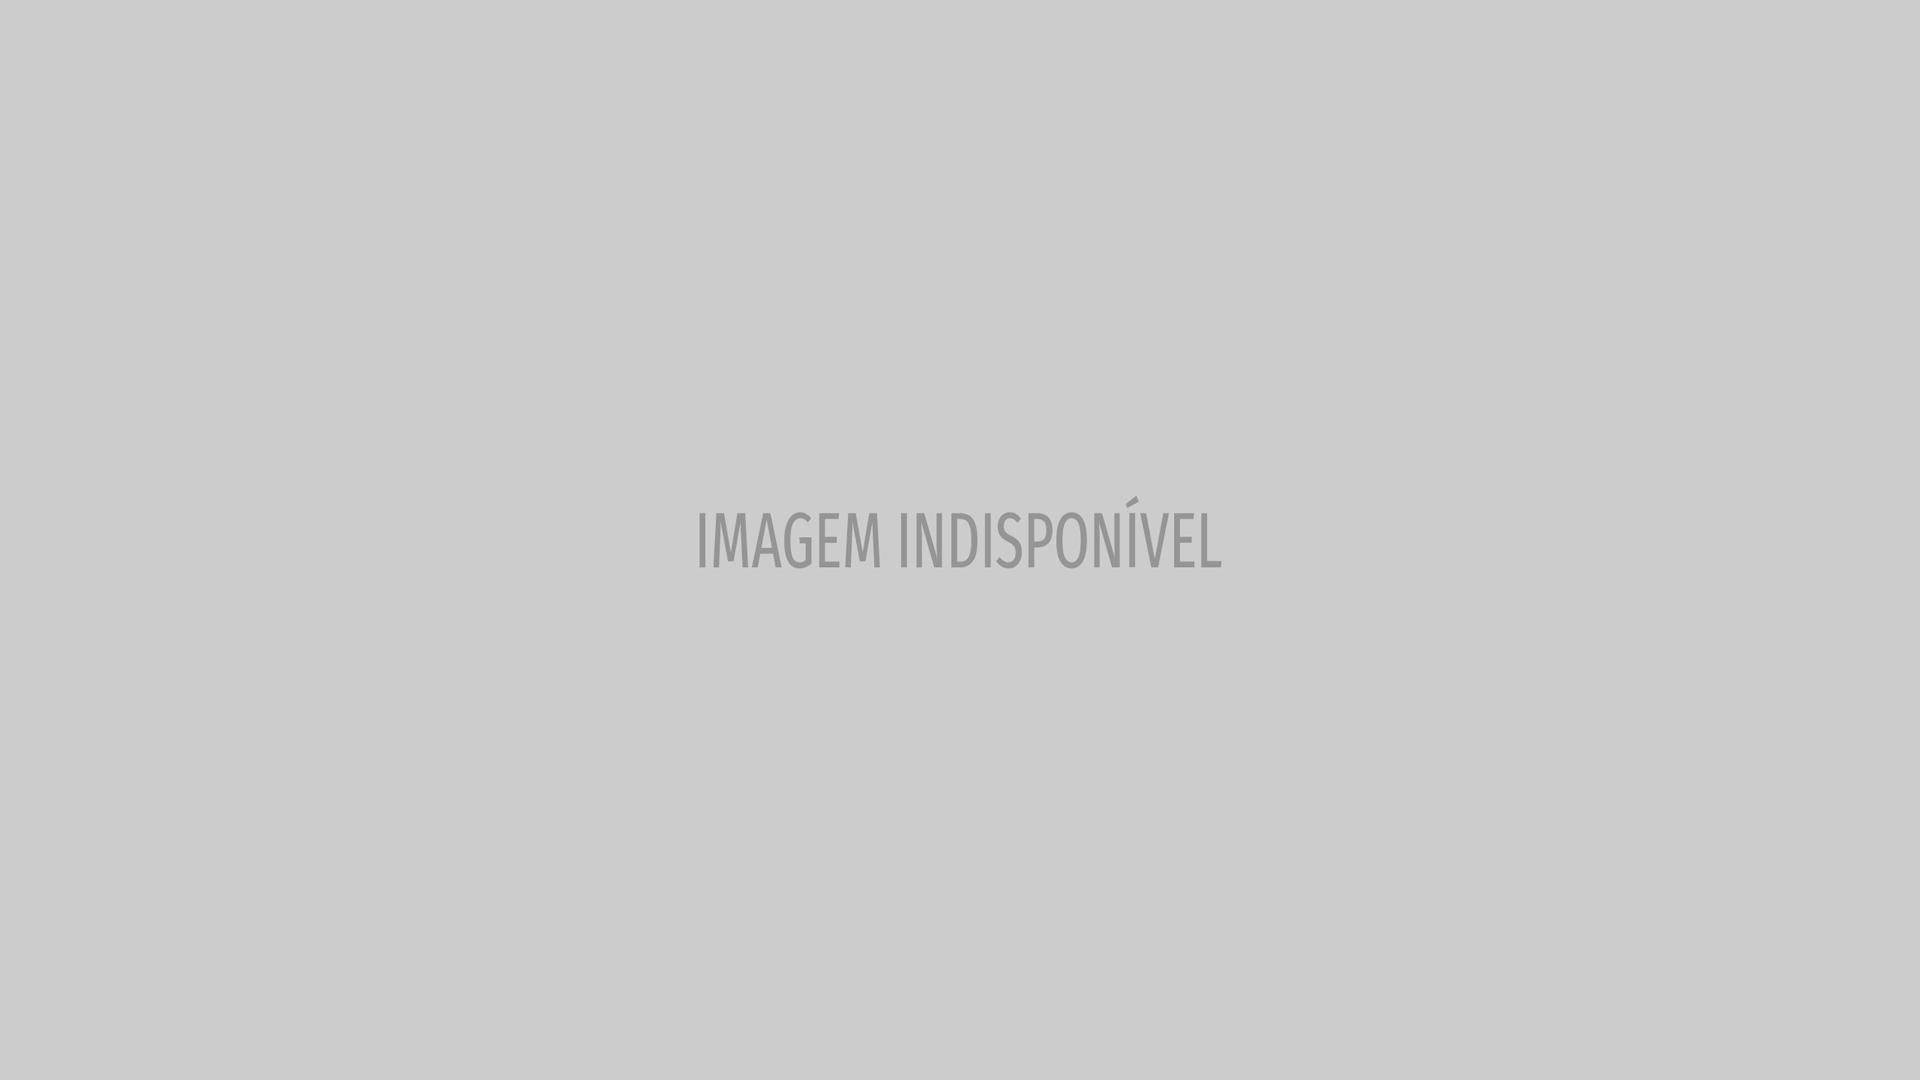 Programa de Ticiana Villa Boas, mulher de Joesley Batista, é mantido